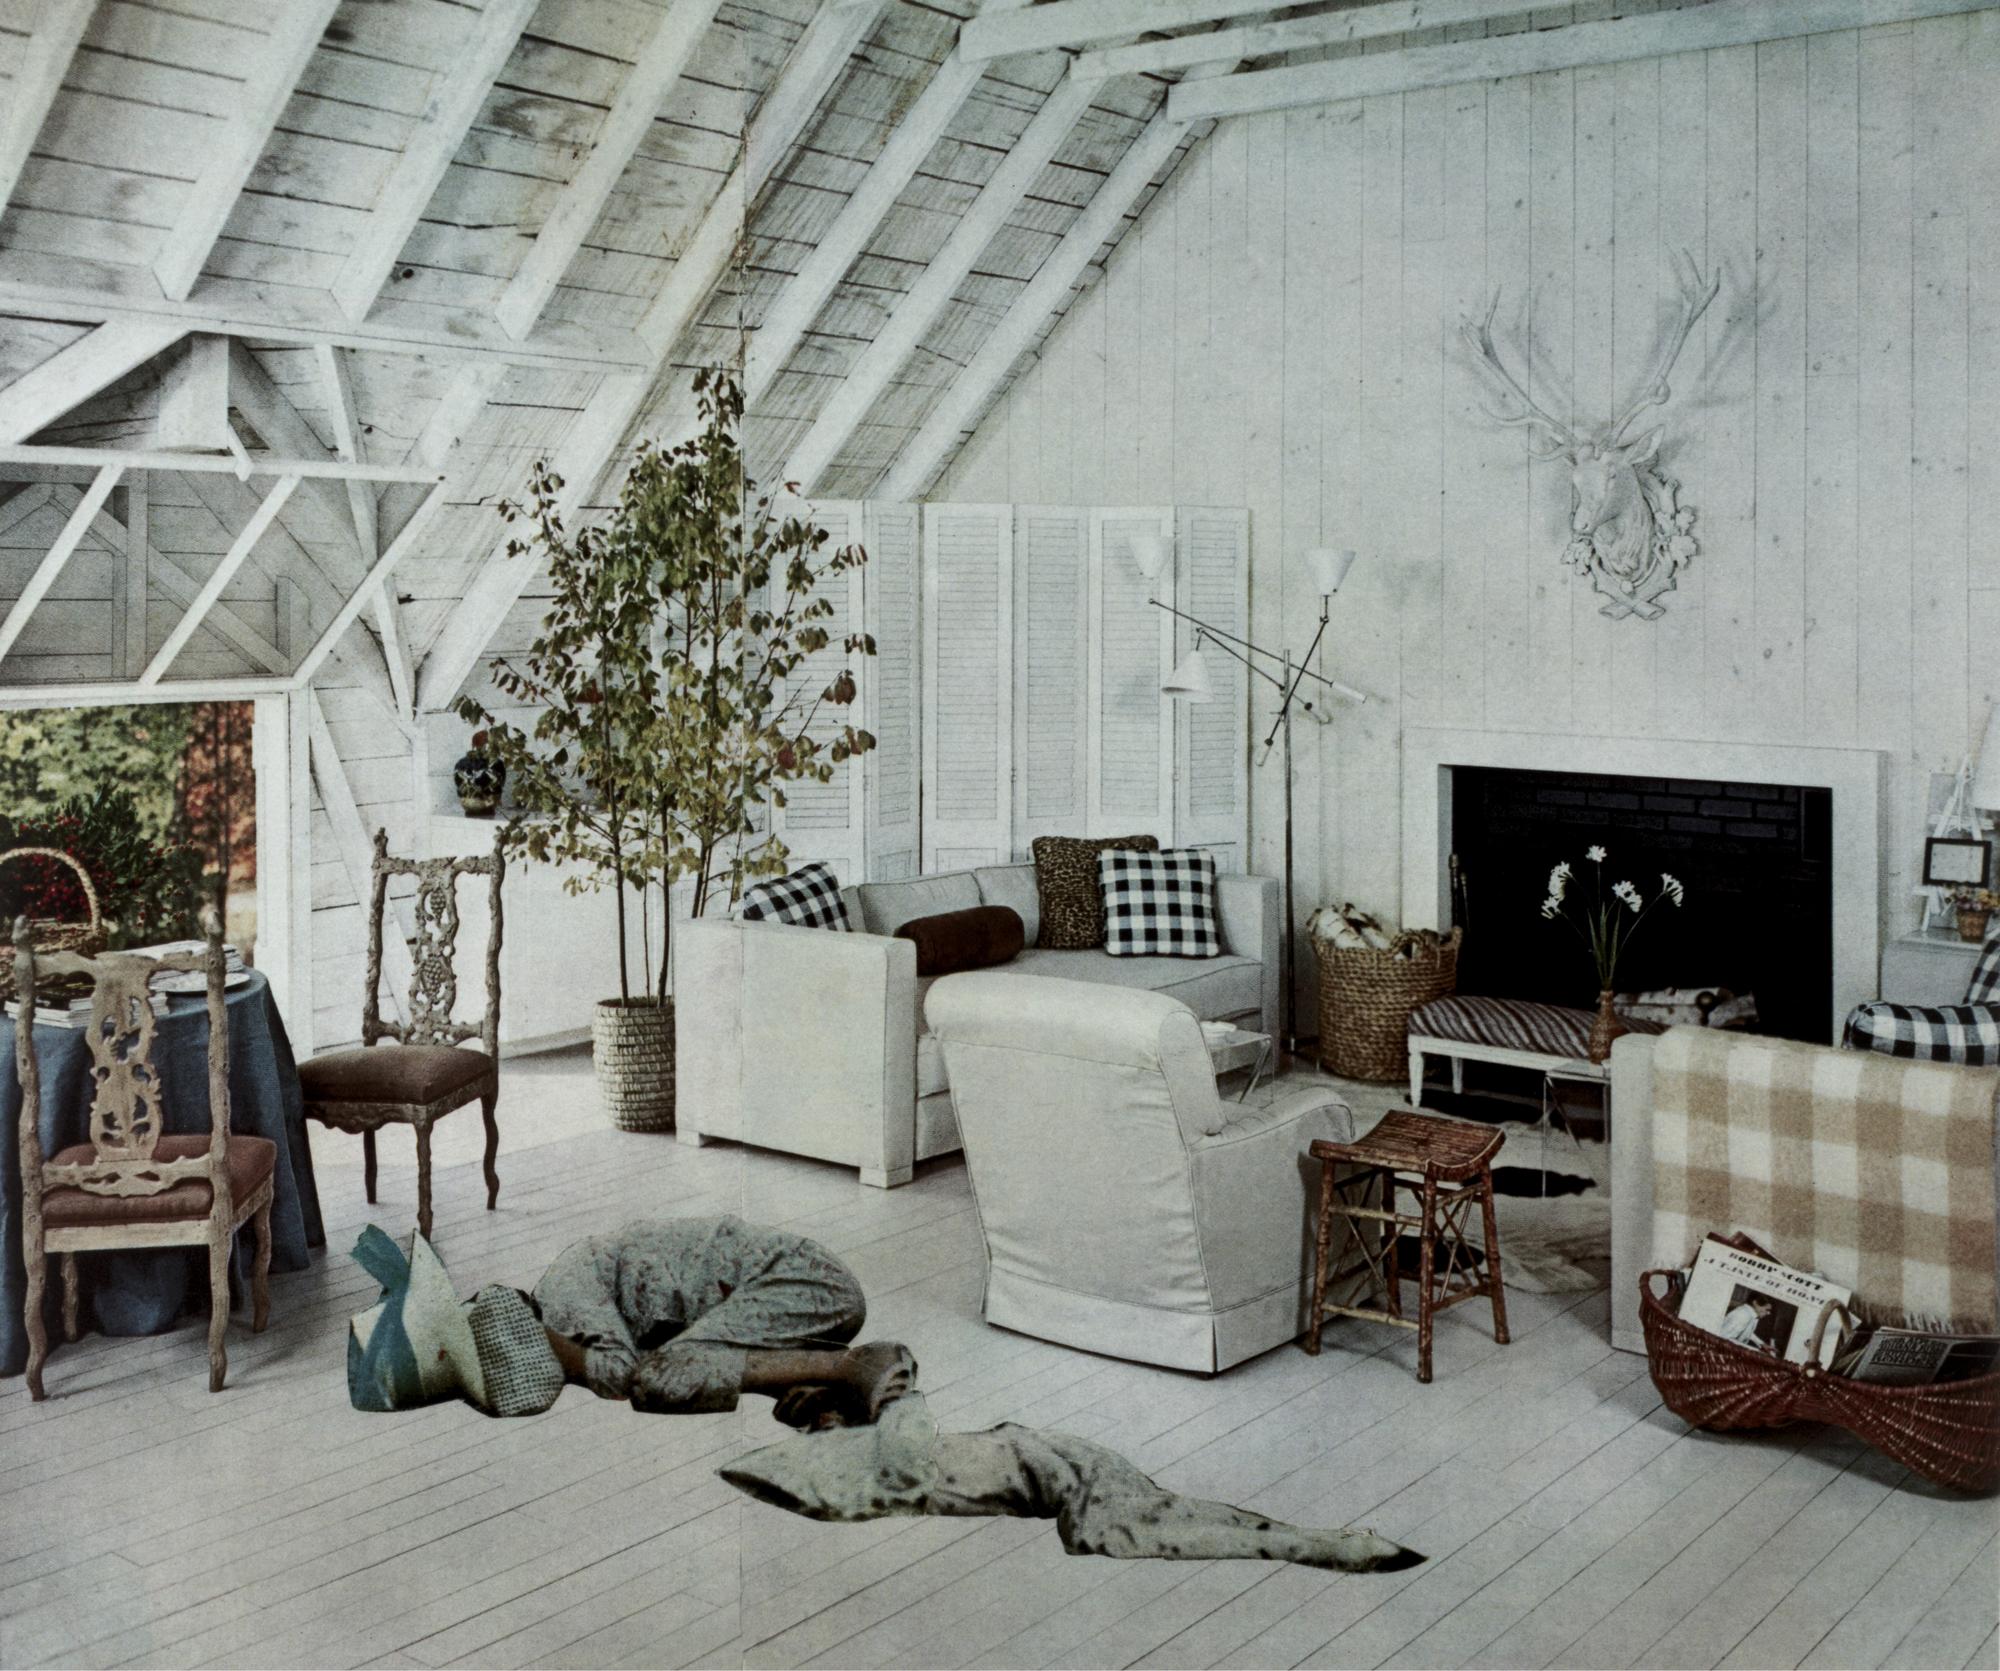 Roadside Ambush, from the series House Beautiful: Bringing the War Home, c. 1967–1972